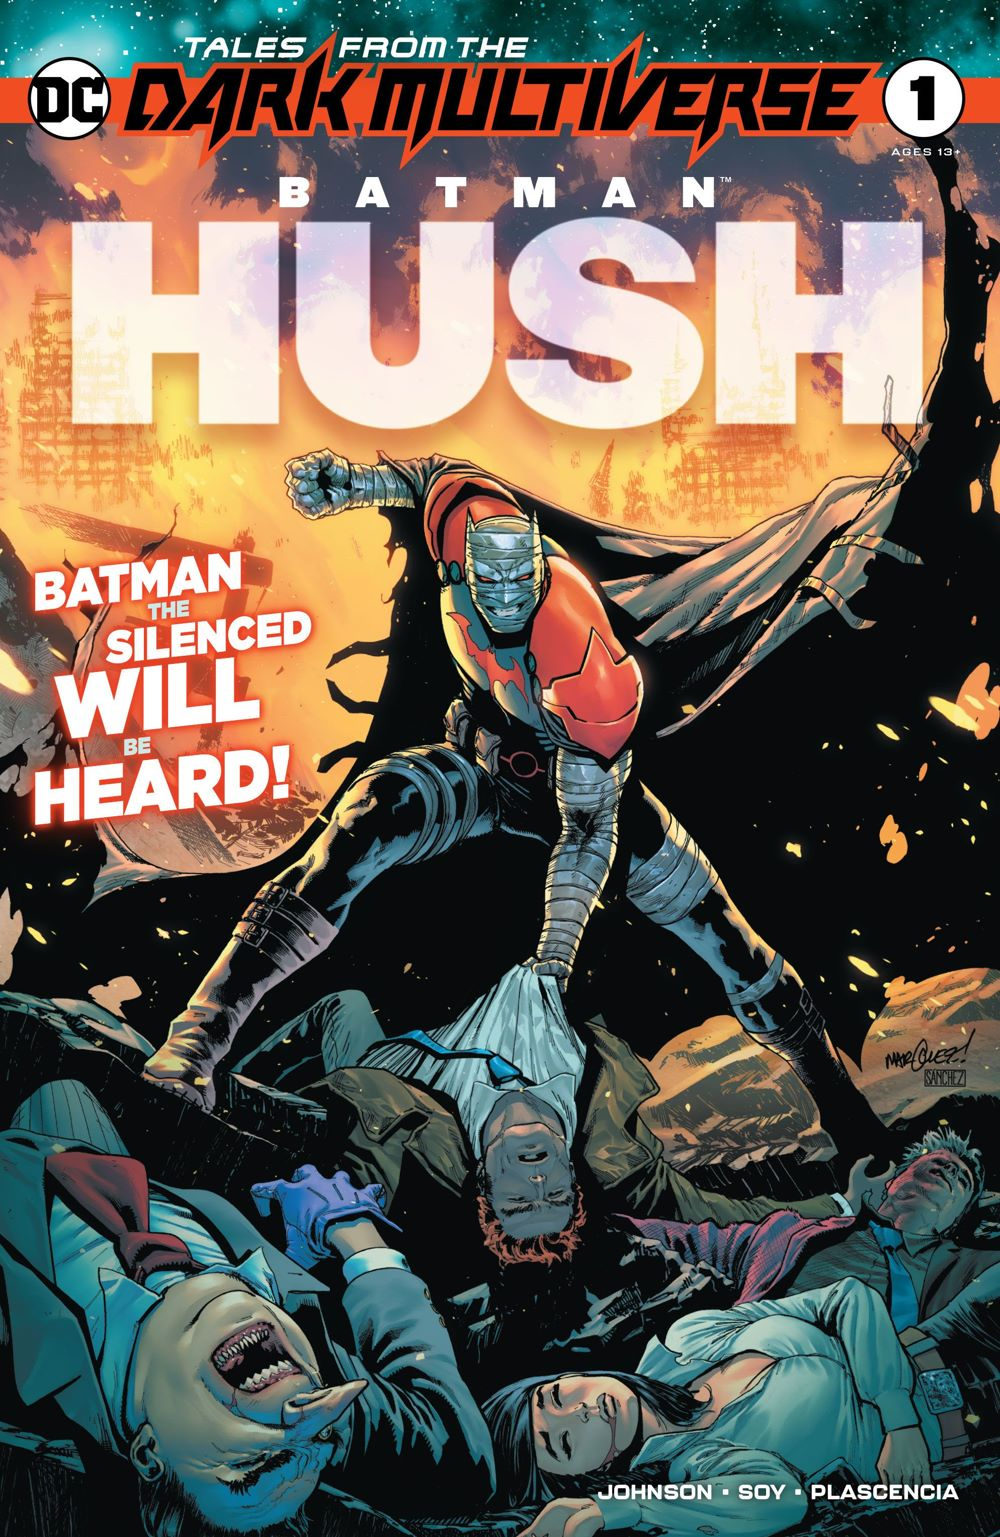 Tales-from-the-Dark-Multiverse-Batman-Hush-Cv1 ComicList Previews: TALES FROM THE DARK MULTIVERSE BATMAN HUSH #1